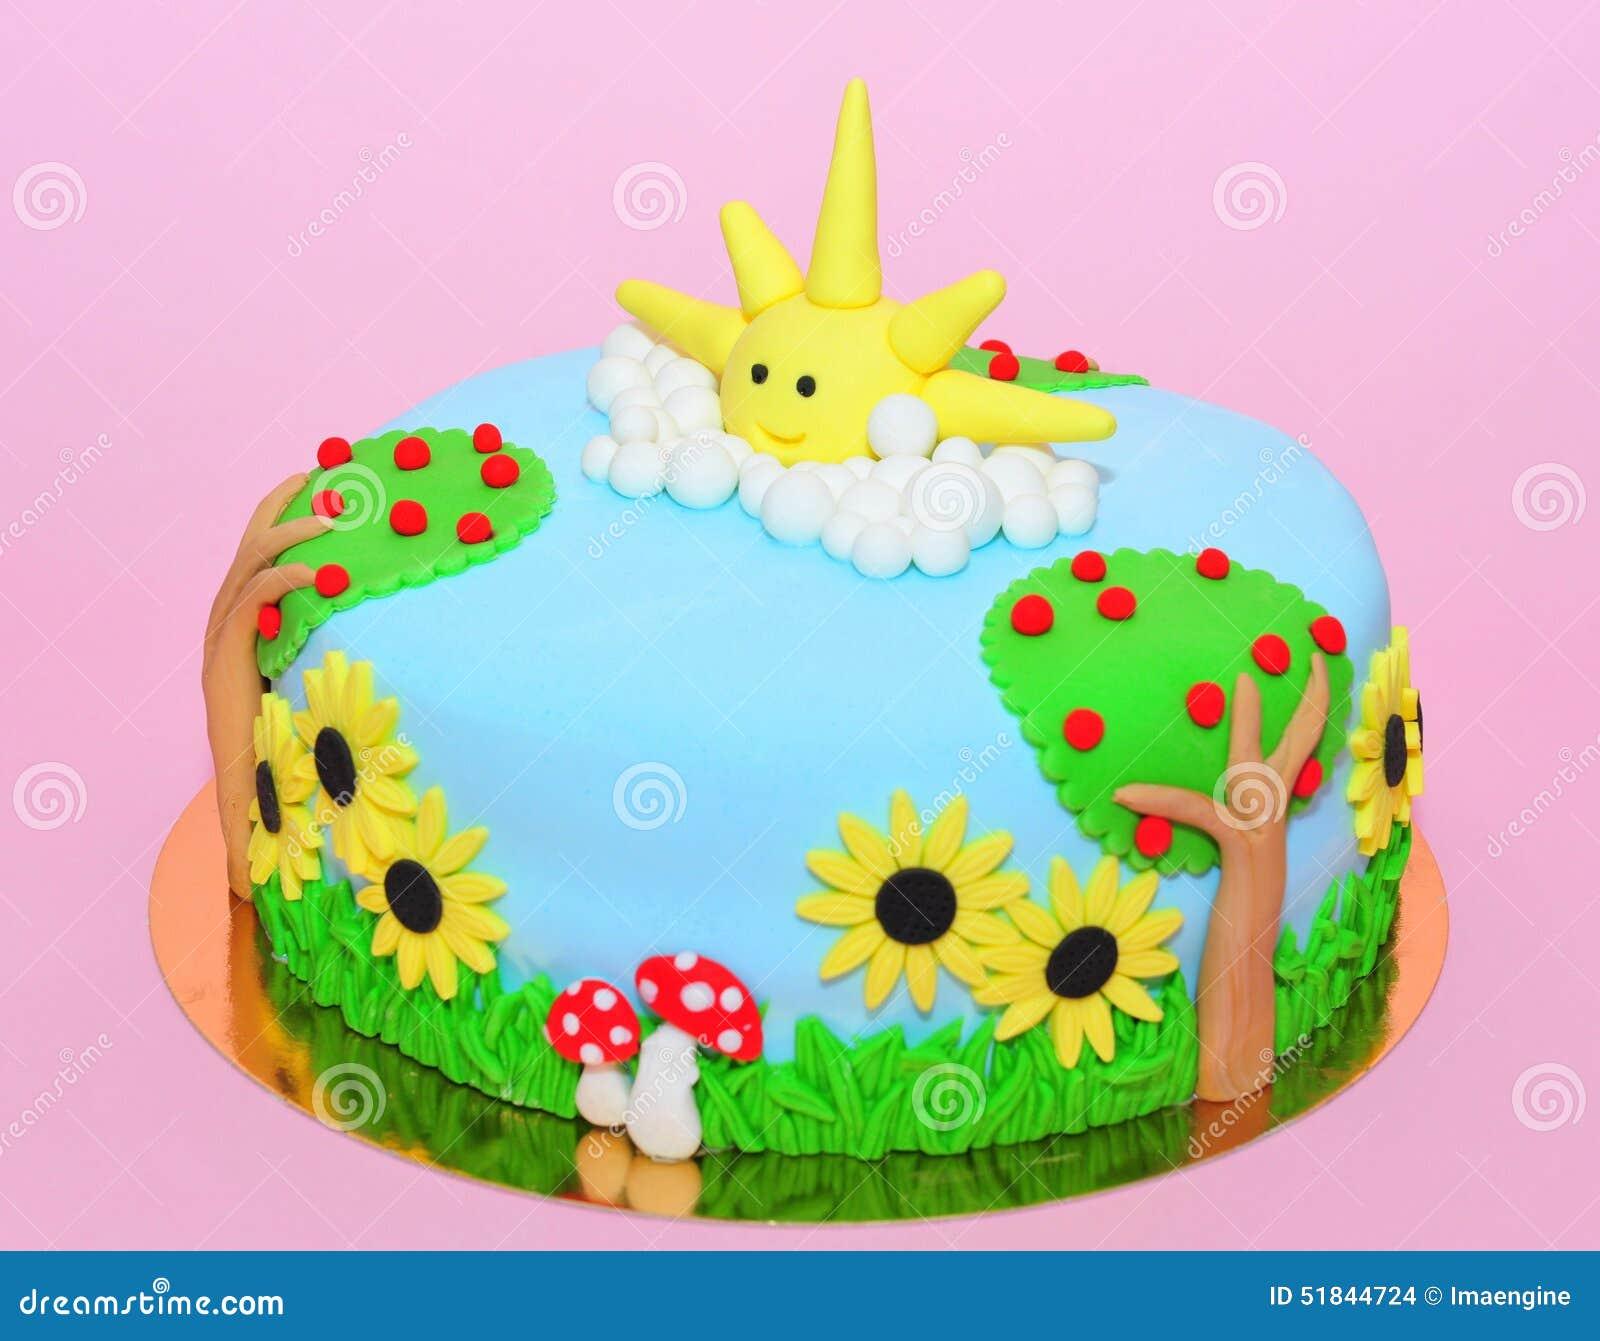 Summer Time Theme Fondant Cake Stock Photo Image 51844724